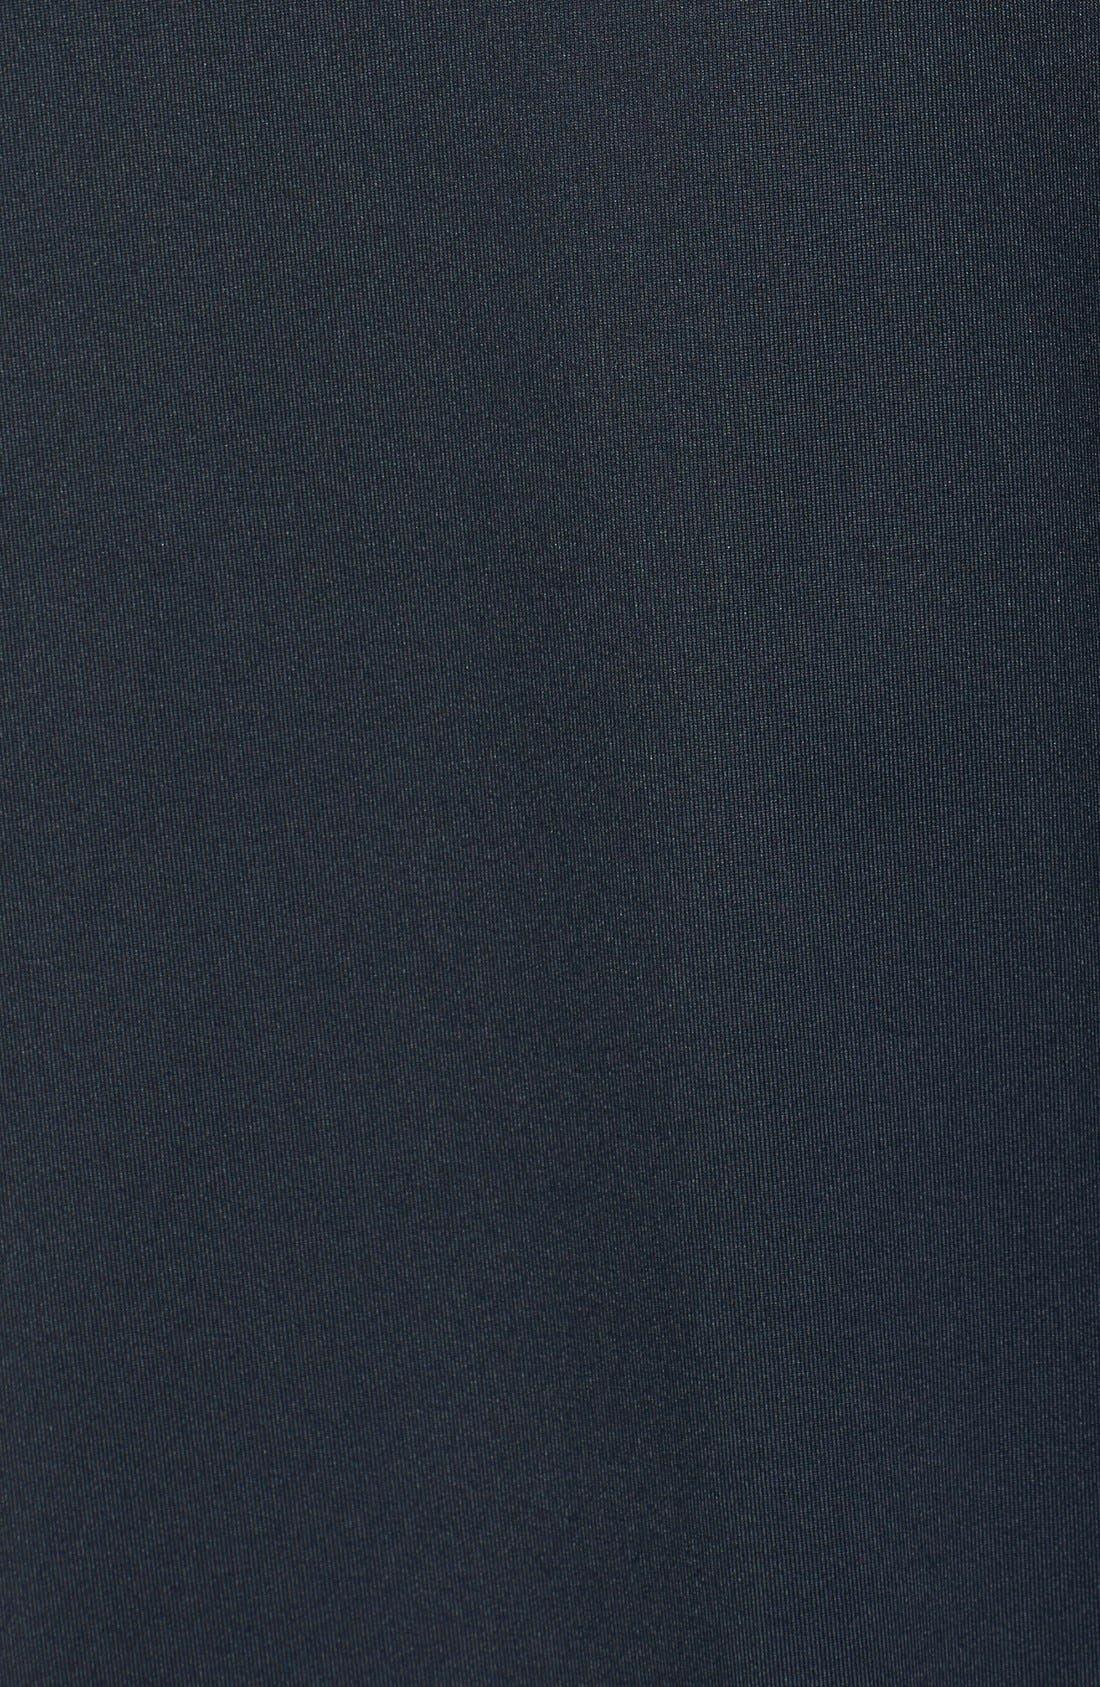 Alternate Image 3  - Travis Mathew 'Fiction' Trim Fit Full Zip Track Jacket